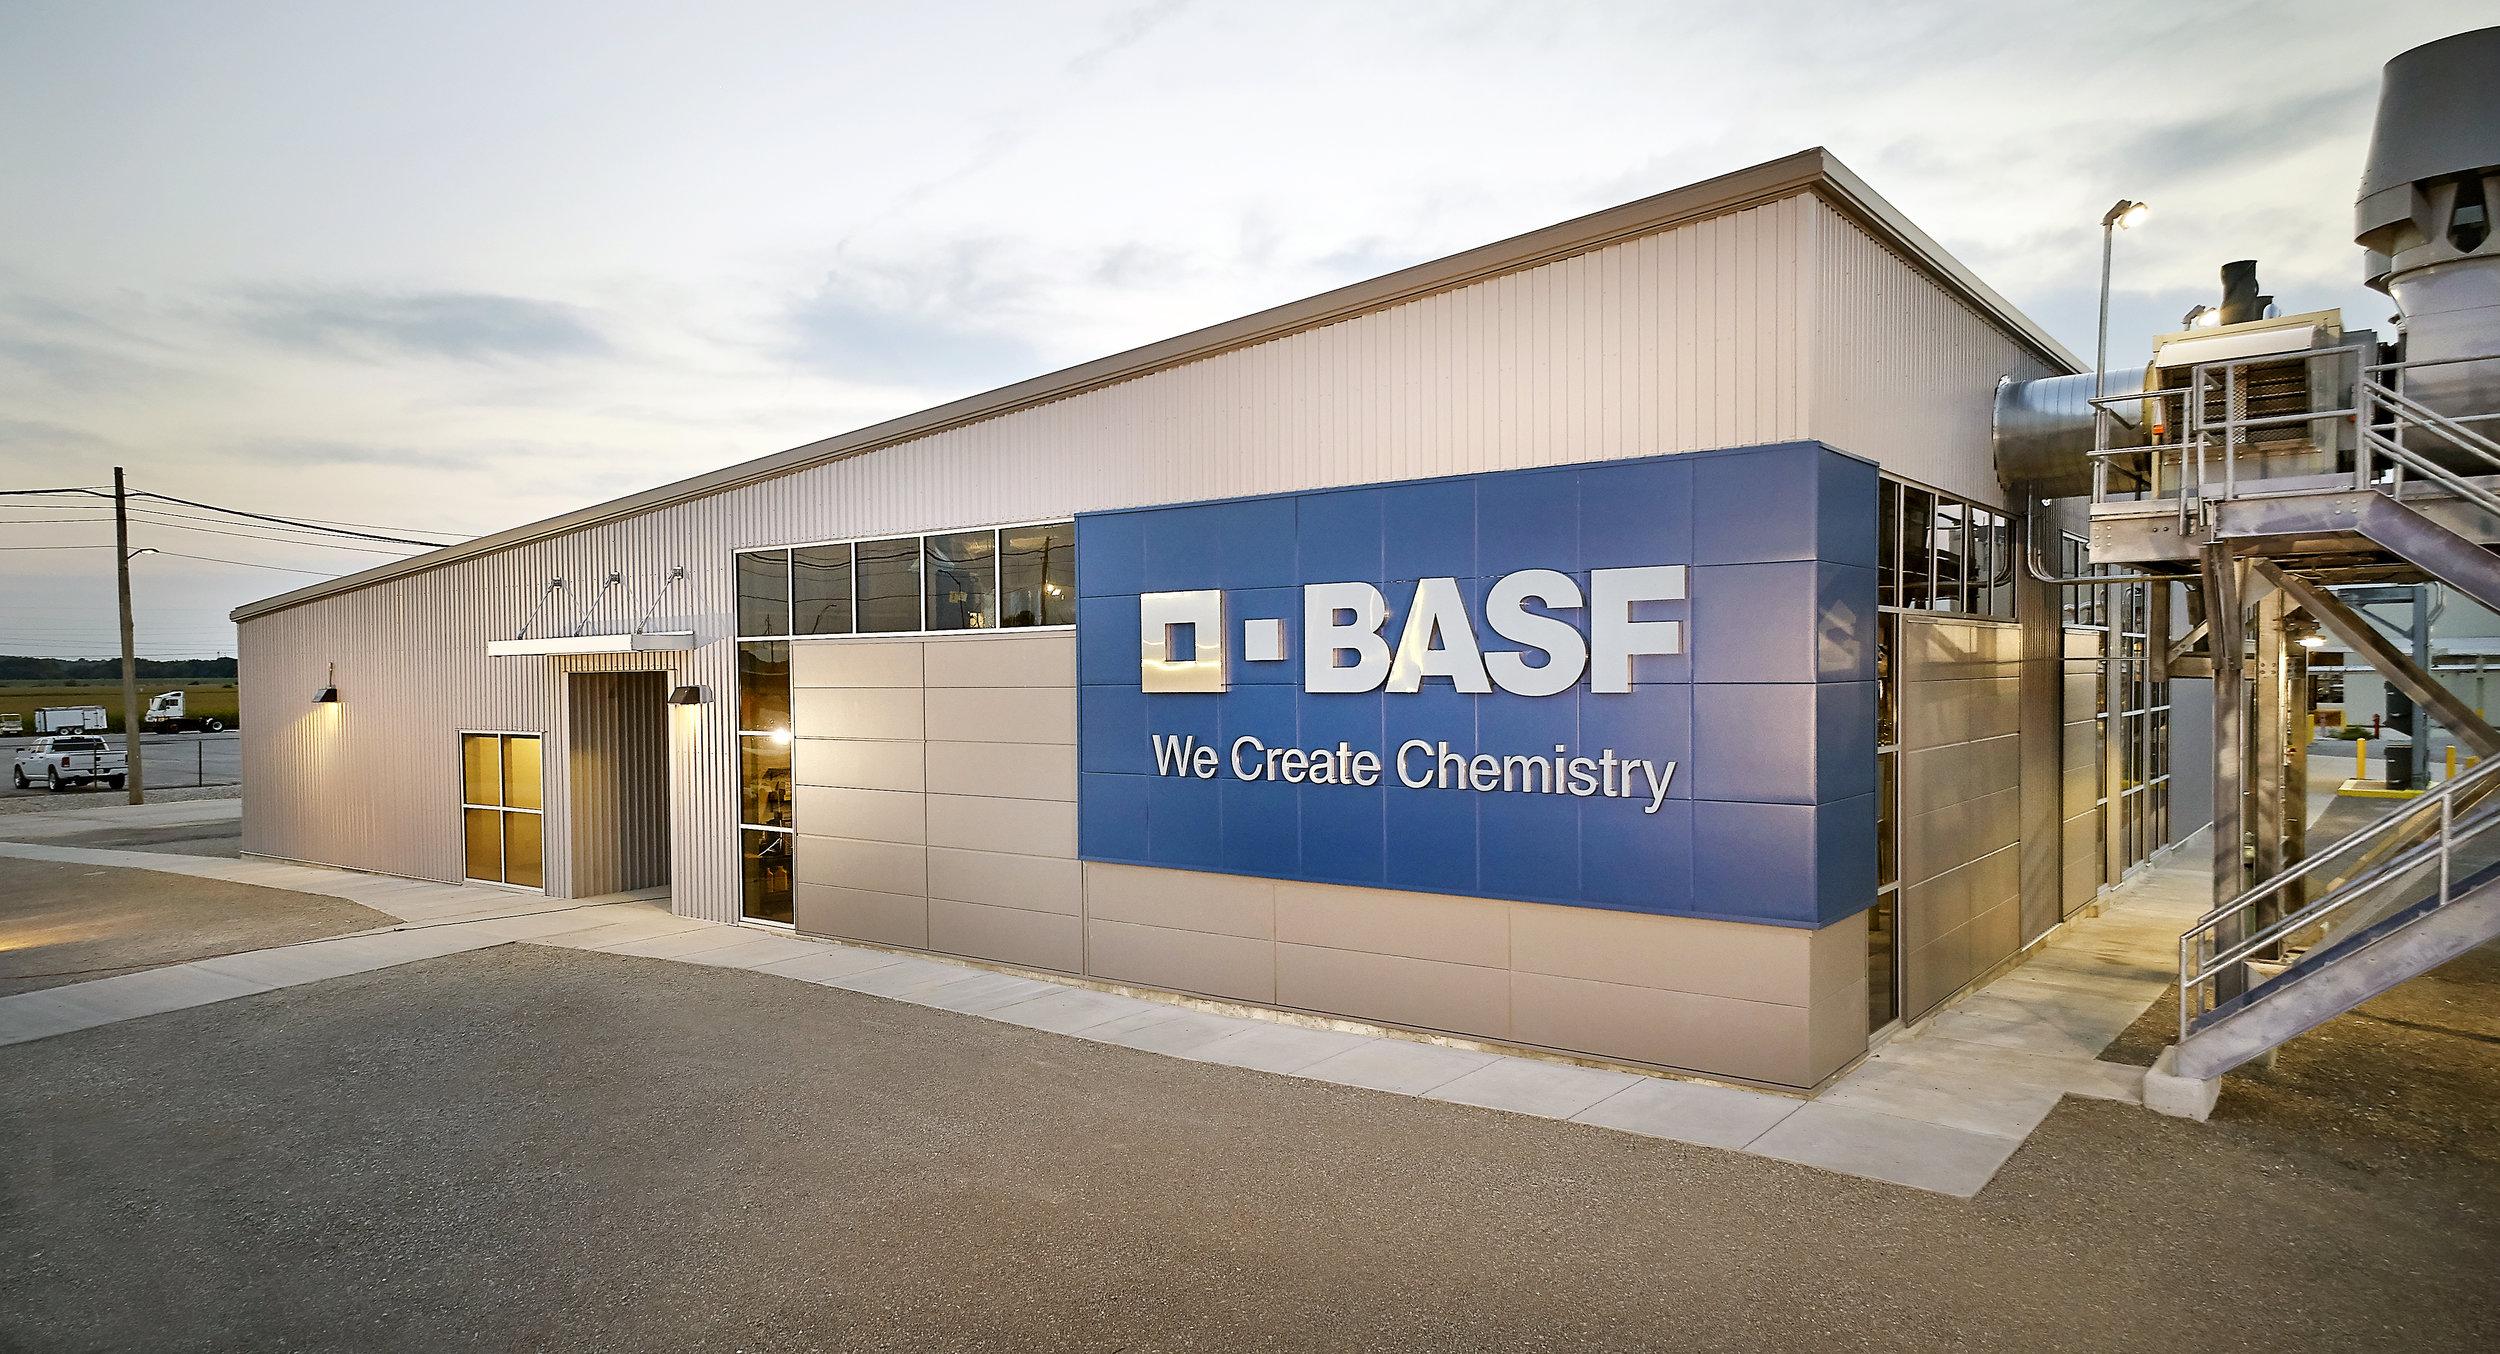 BASF Hannibal Agriculture Lab